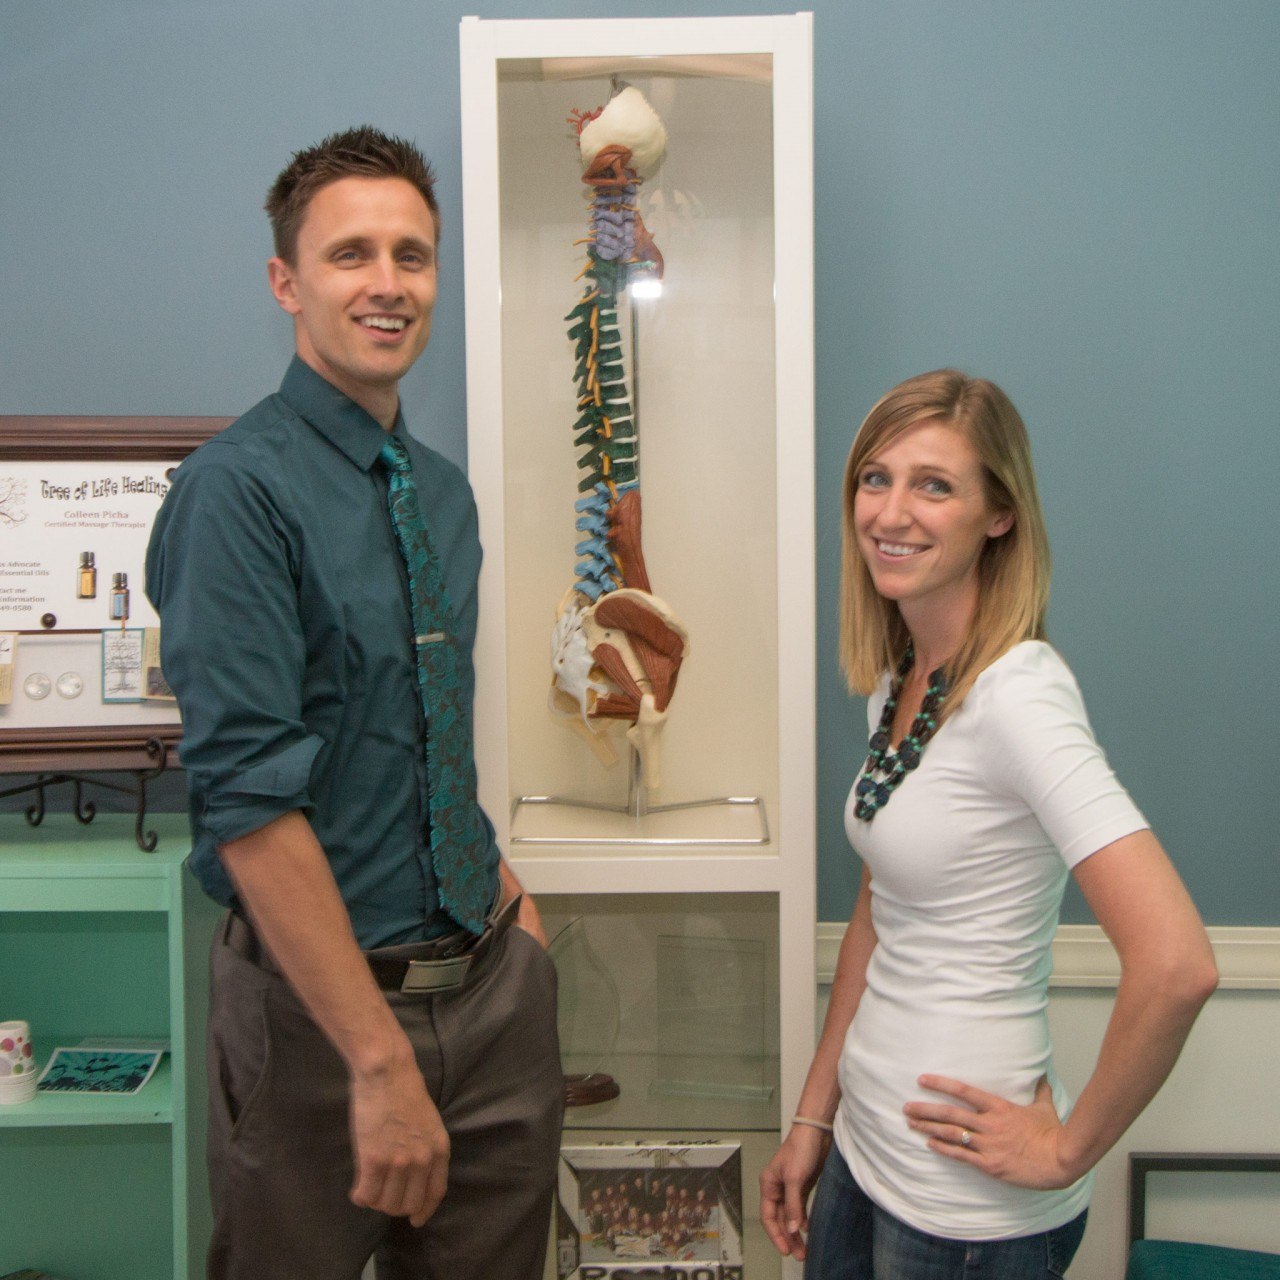 Dr. Jacob Conway & Dr. Bridget Conway